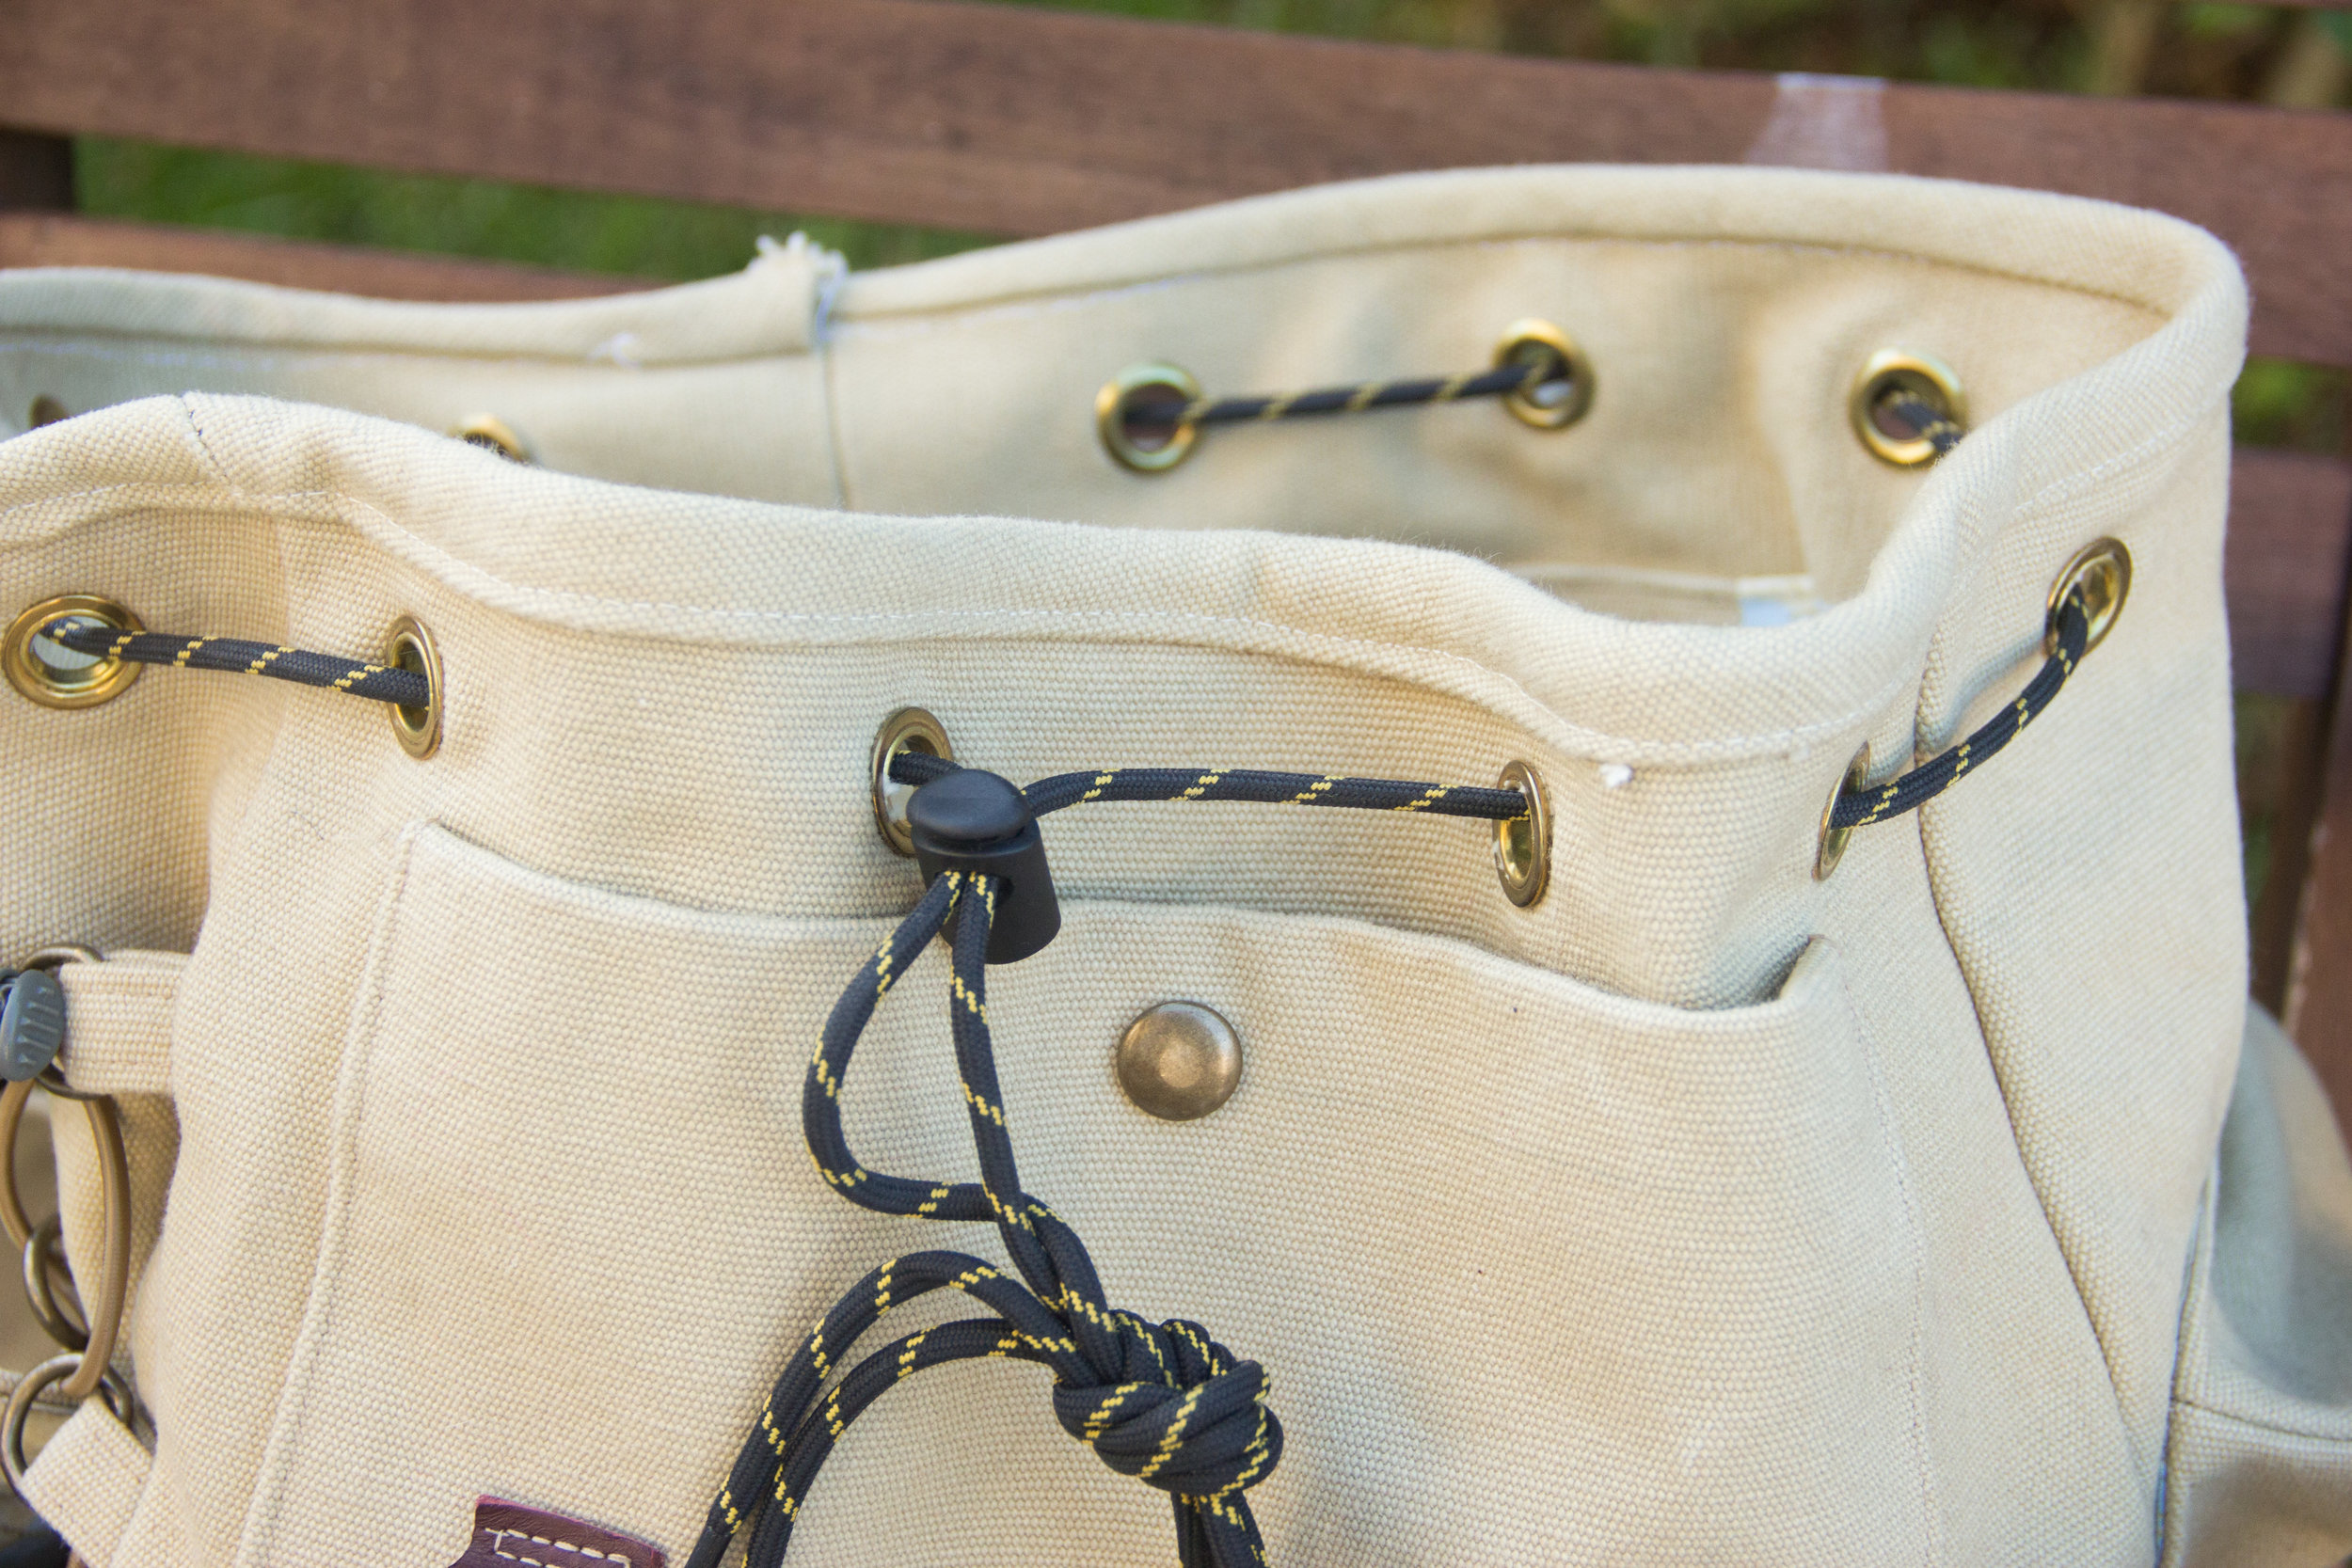 knapsack drawstring closure